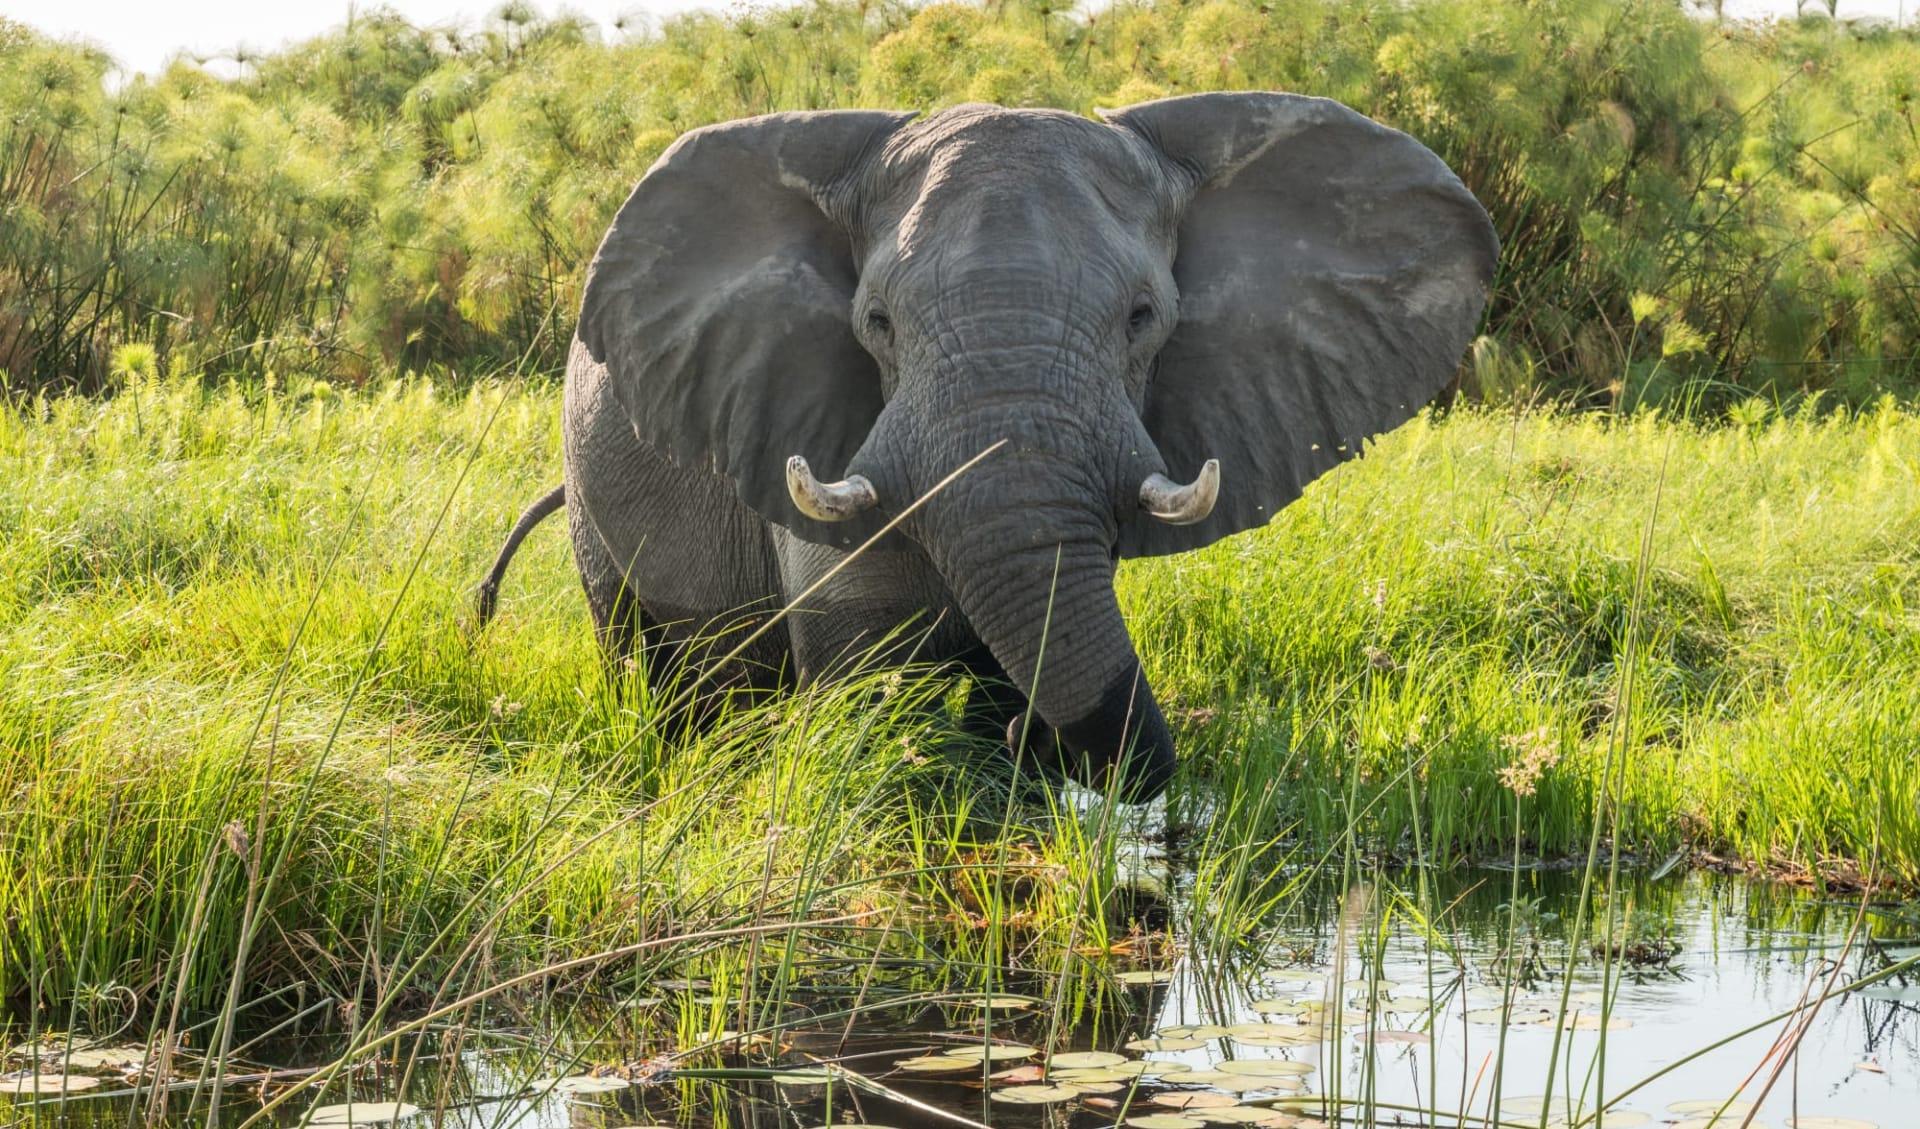 4 C's (Commerce, Conservation, Community & Culture) ab Kapstadt: Botswana - Okavango Delta - Elefant